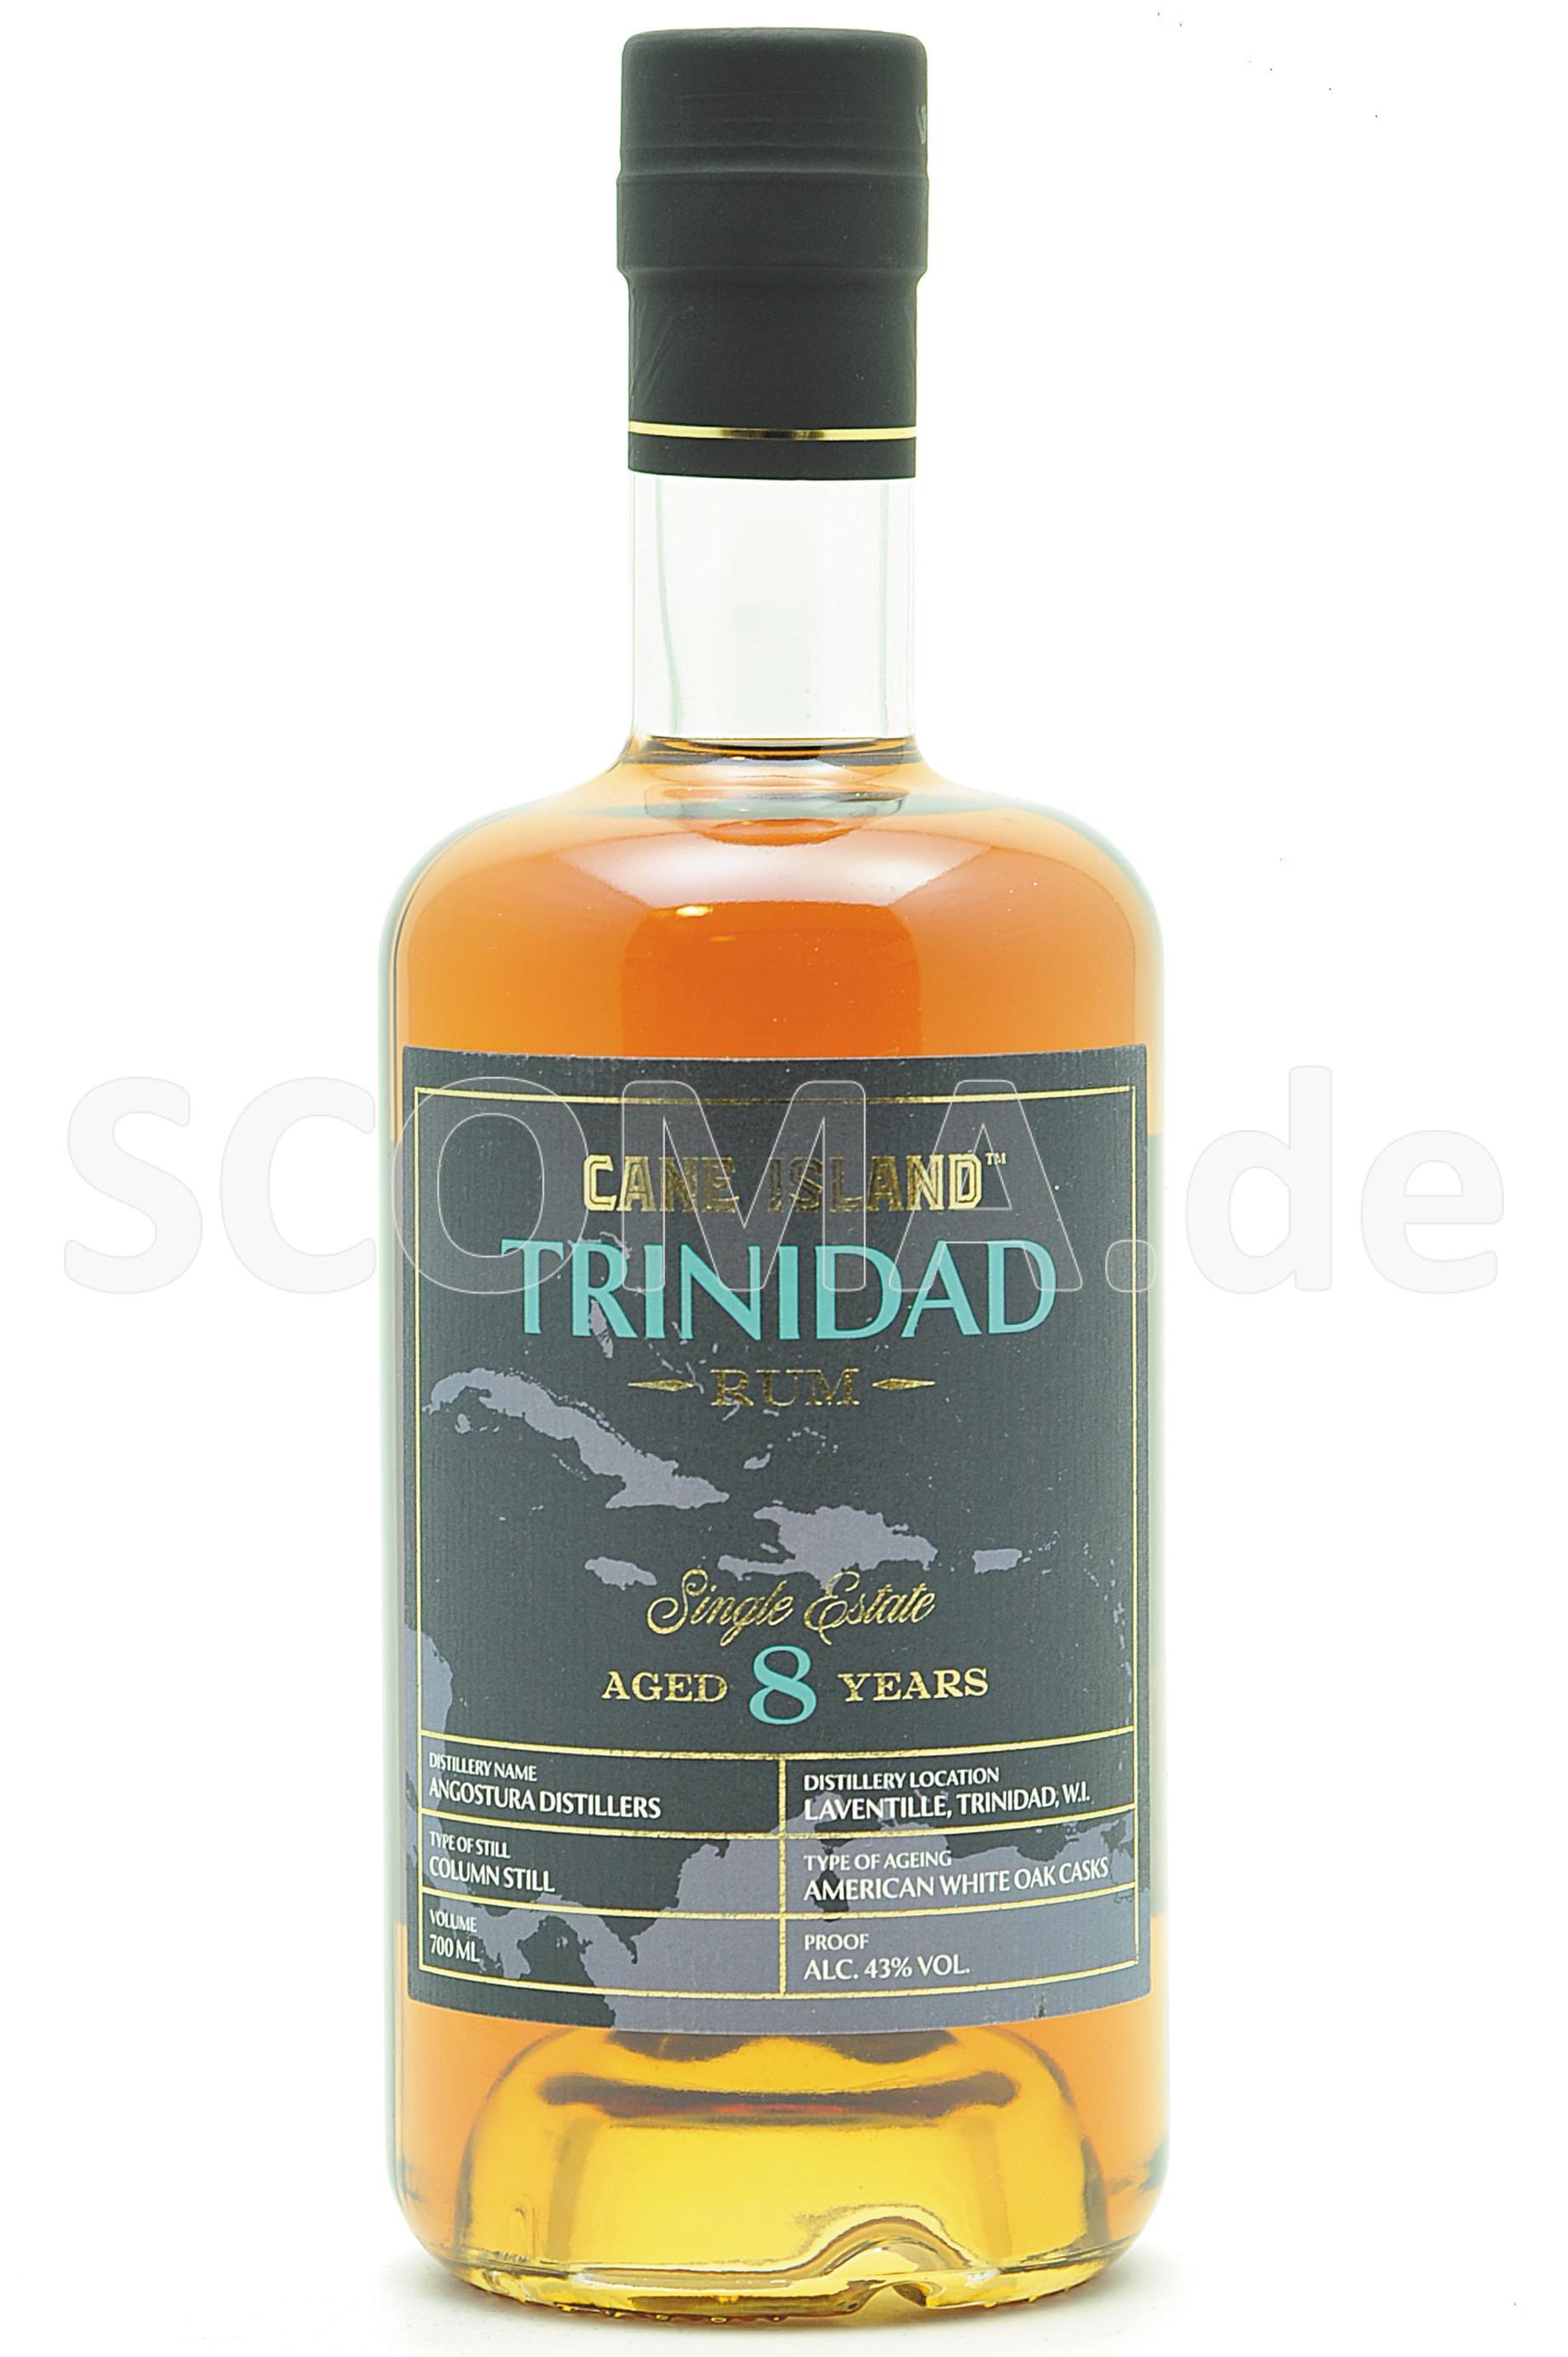 Cane Island Trinidad Rum 8 yea...